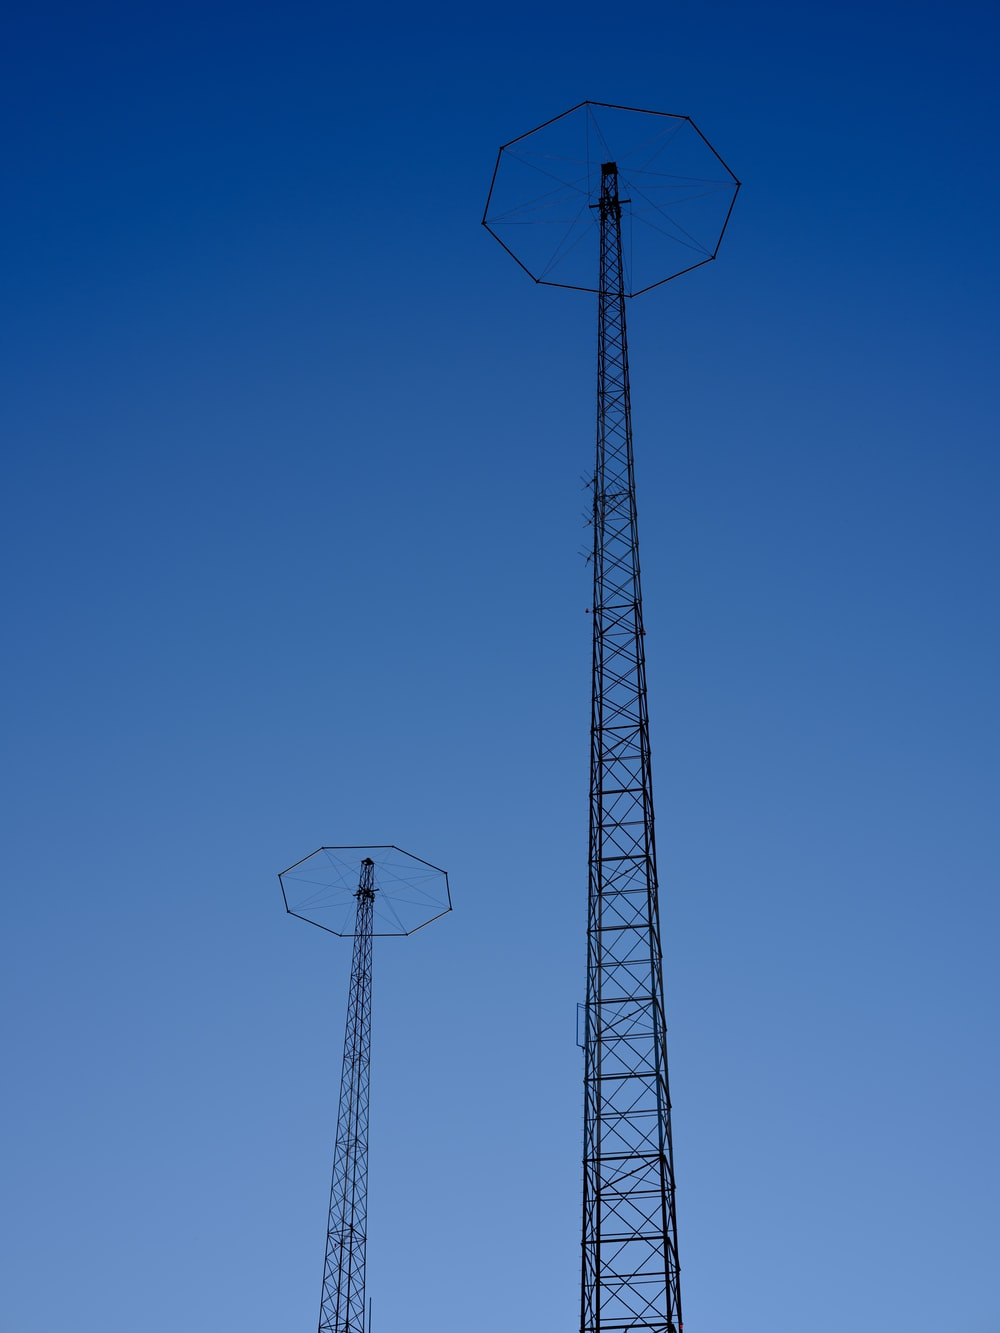 black steel electric post under blue sky during daytime